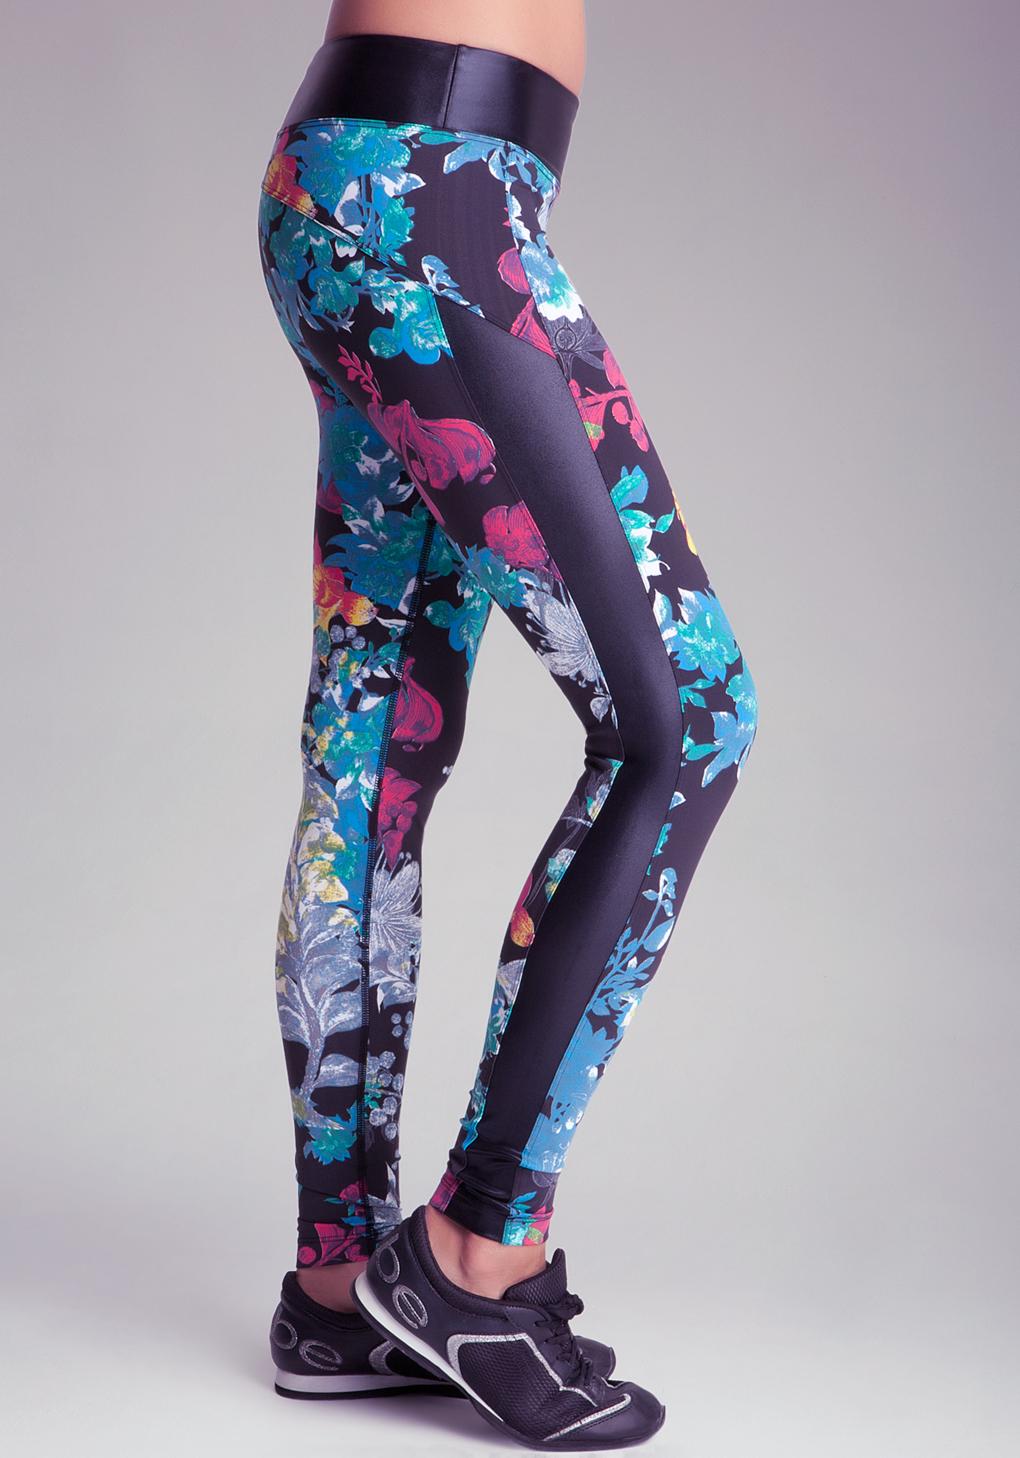 0f19cf7347e3 Lyst - Bebe Mesh Inset Printed Legging